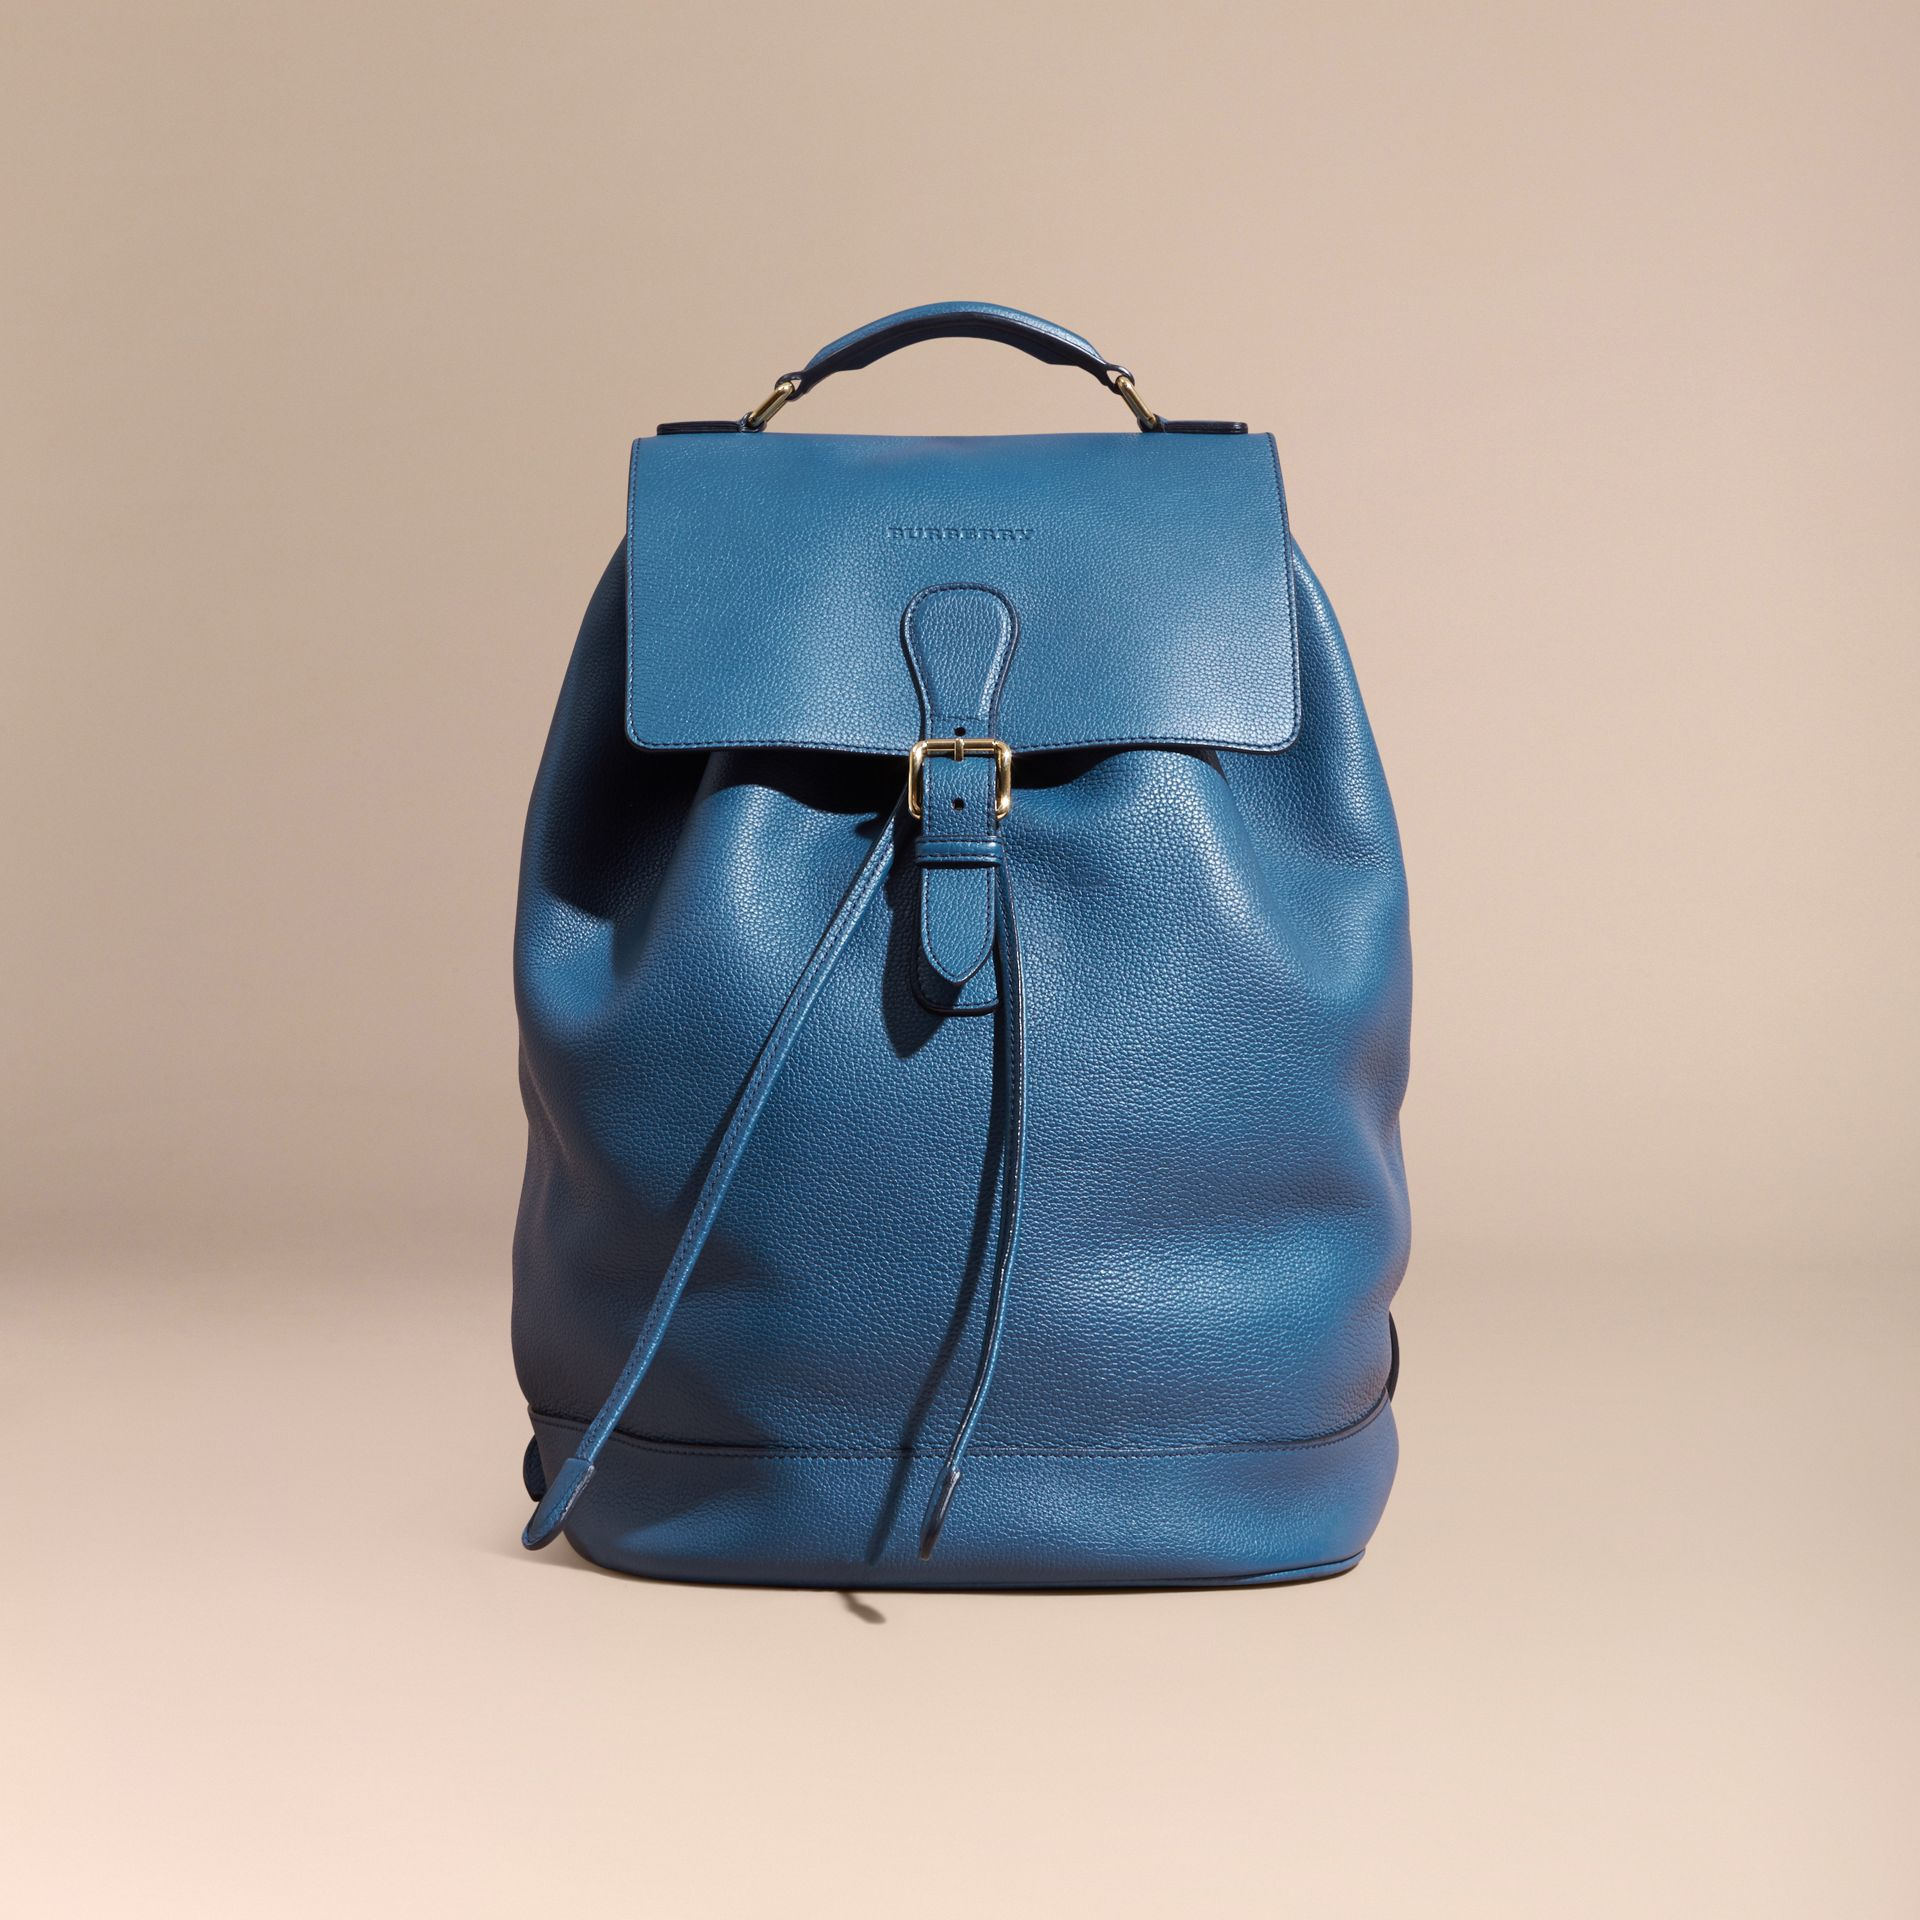 Mineralblau Rucksack aus genarbtem Leder Mineralblau - Galerie-Bild 9